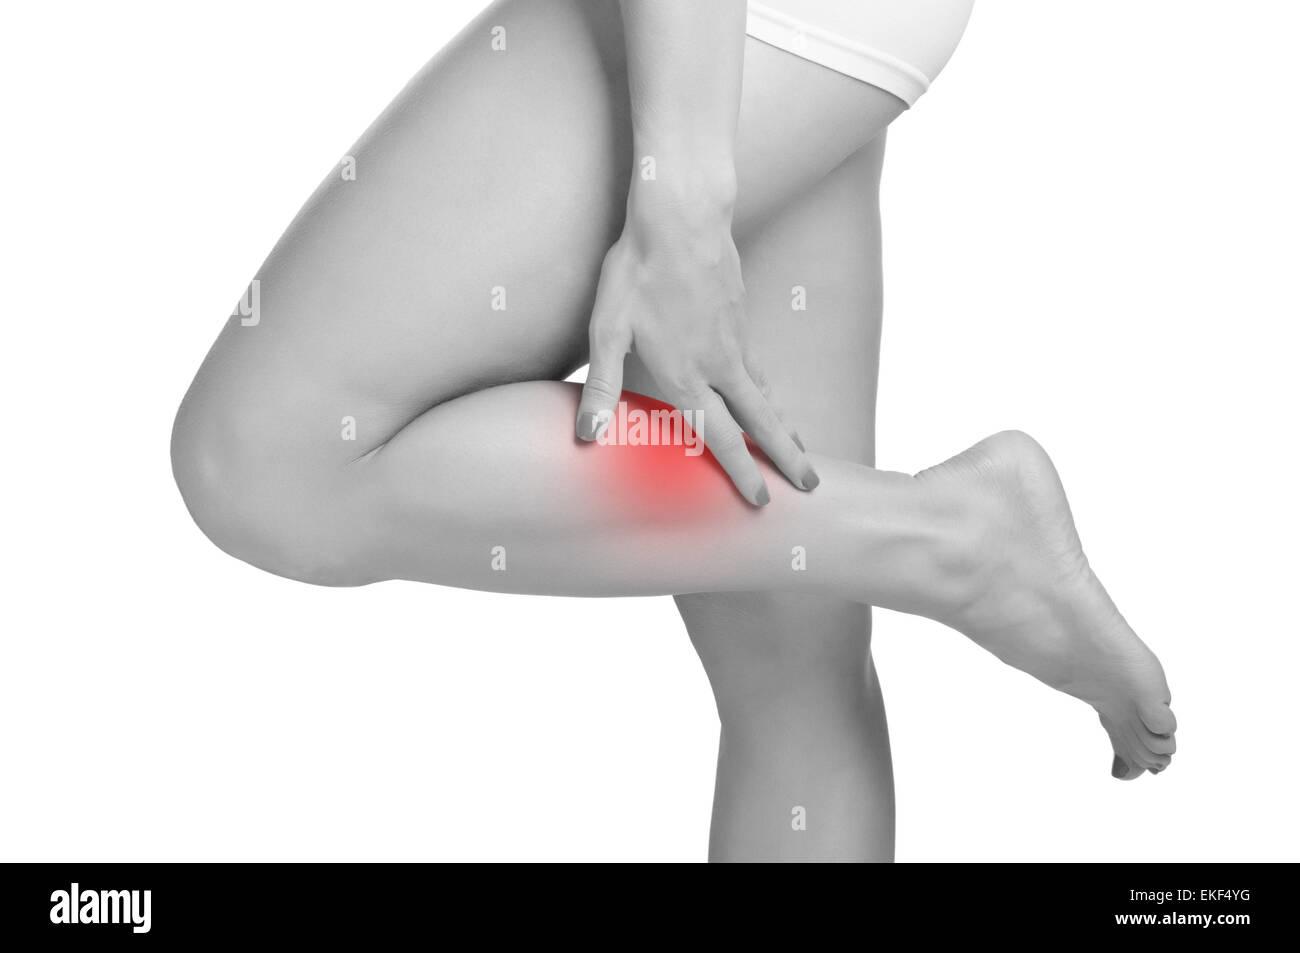 Douleur dans la jambe Photo Stock